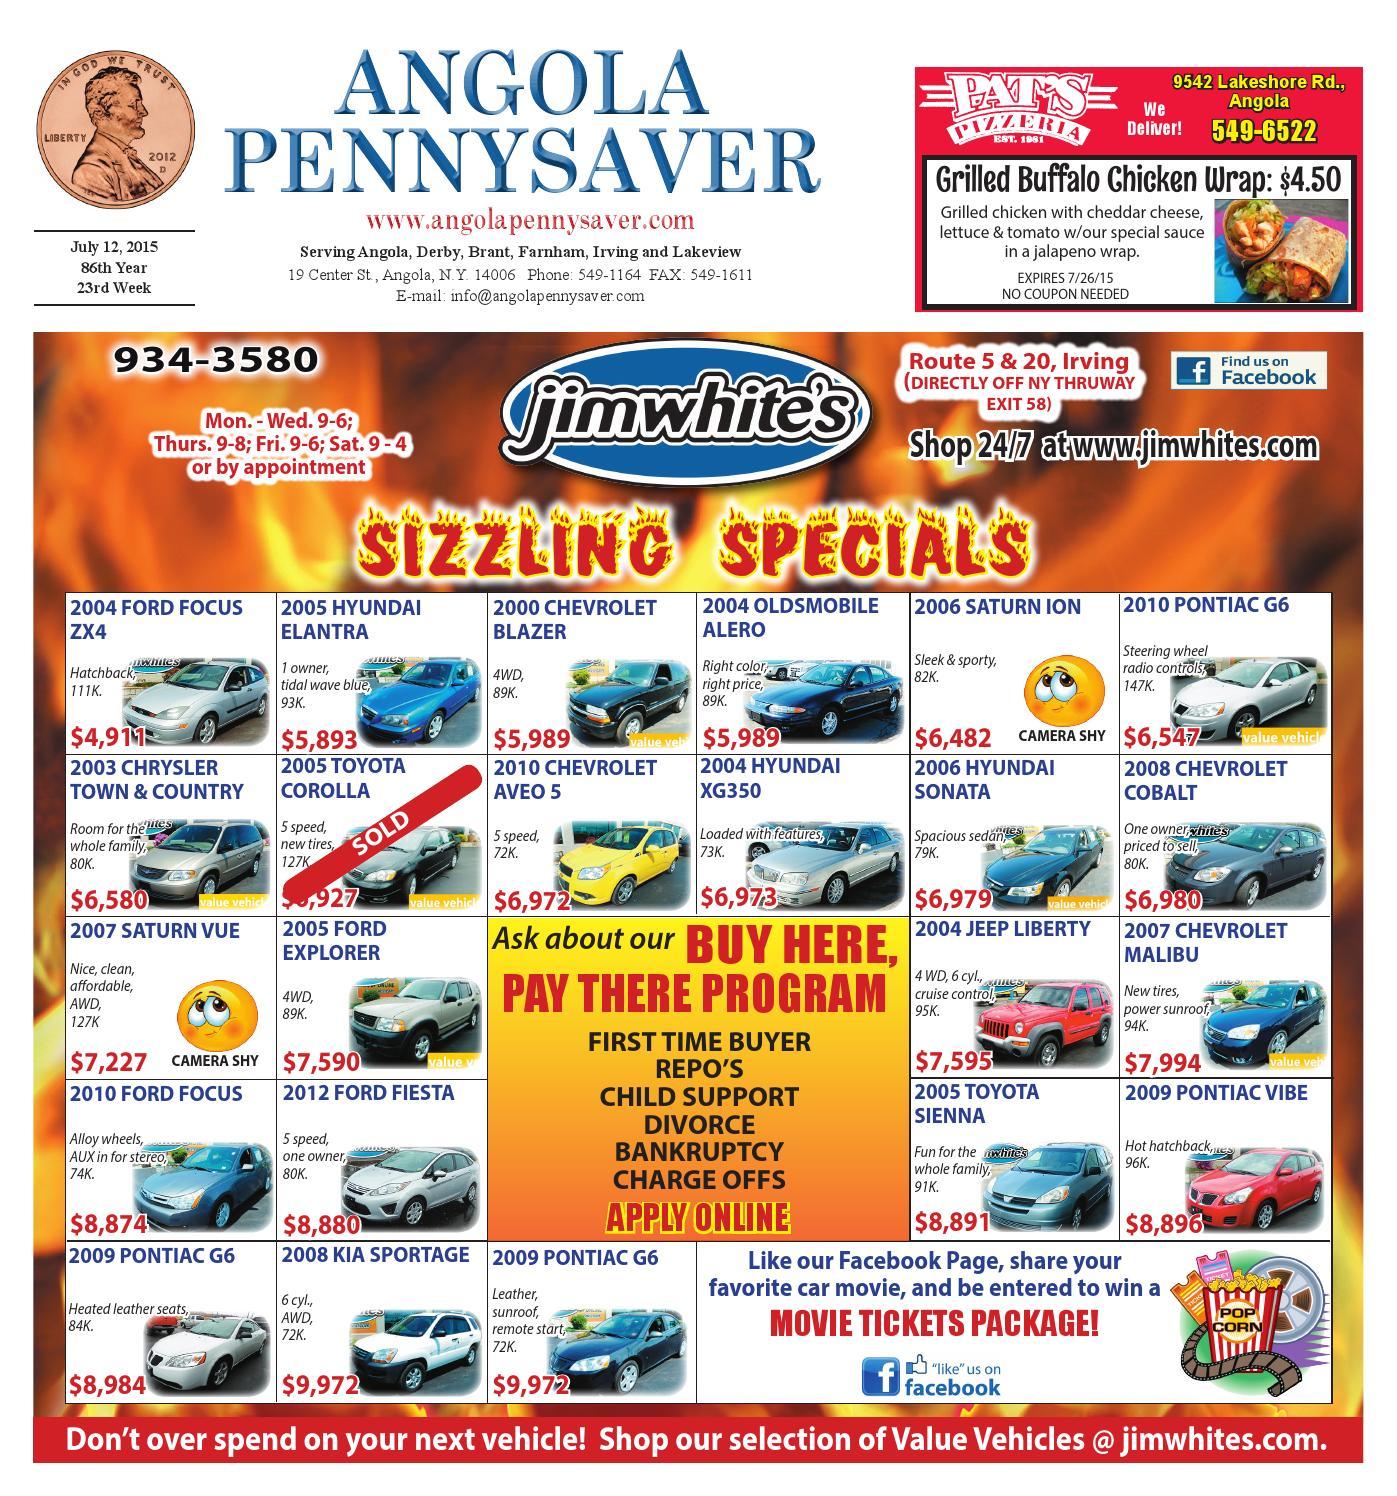 hight resolution of 7 12 15 angola pennysaver